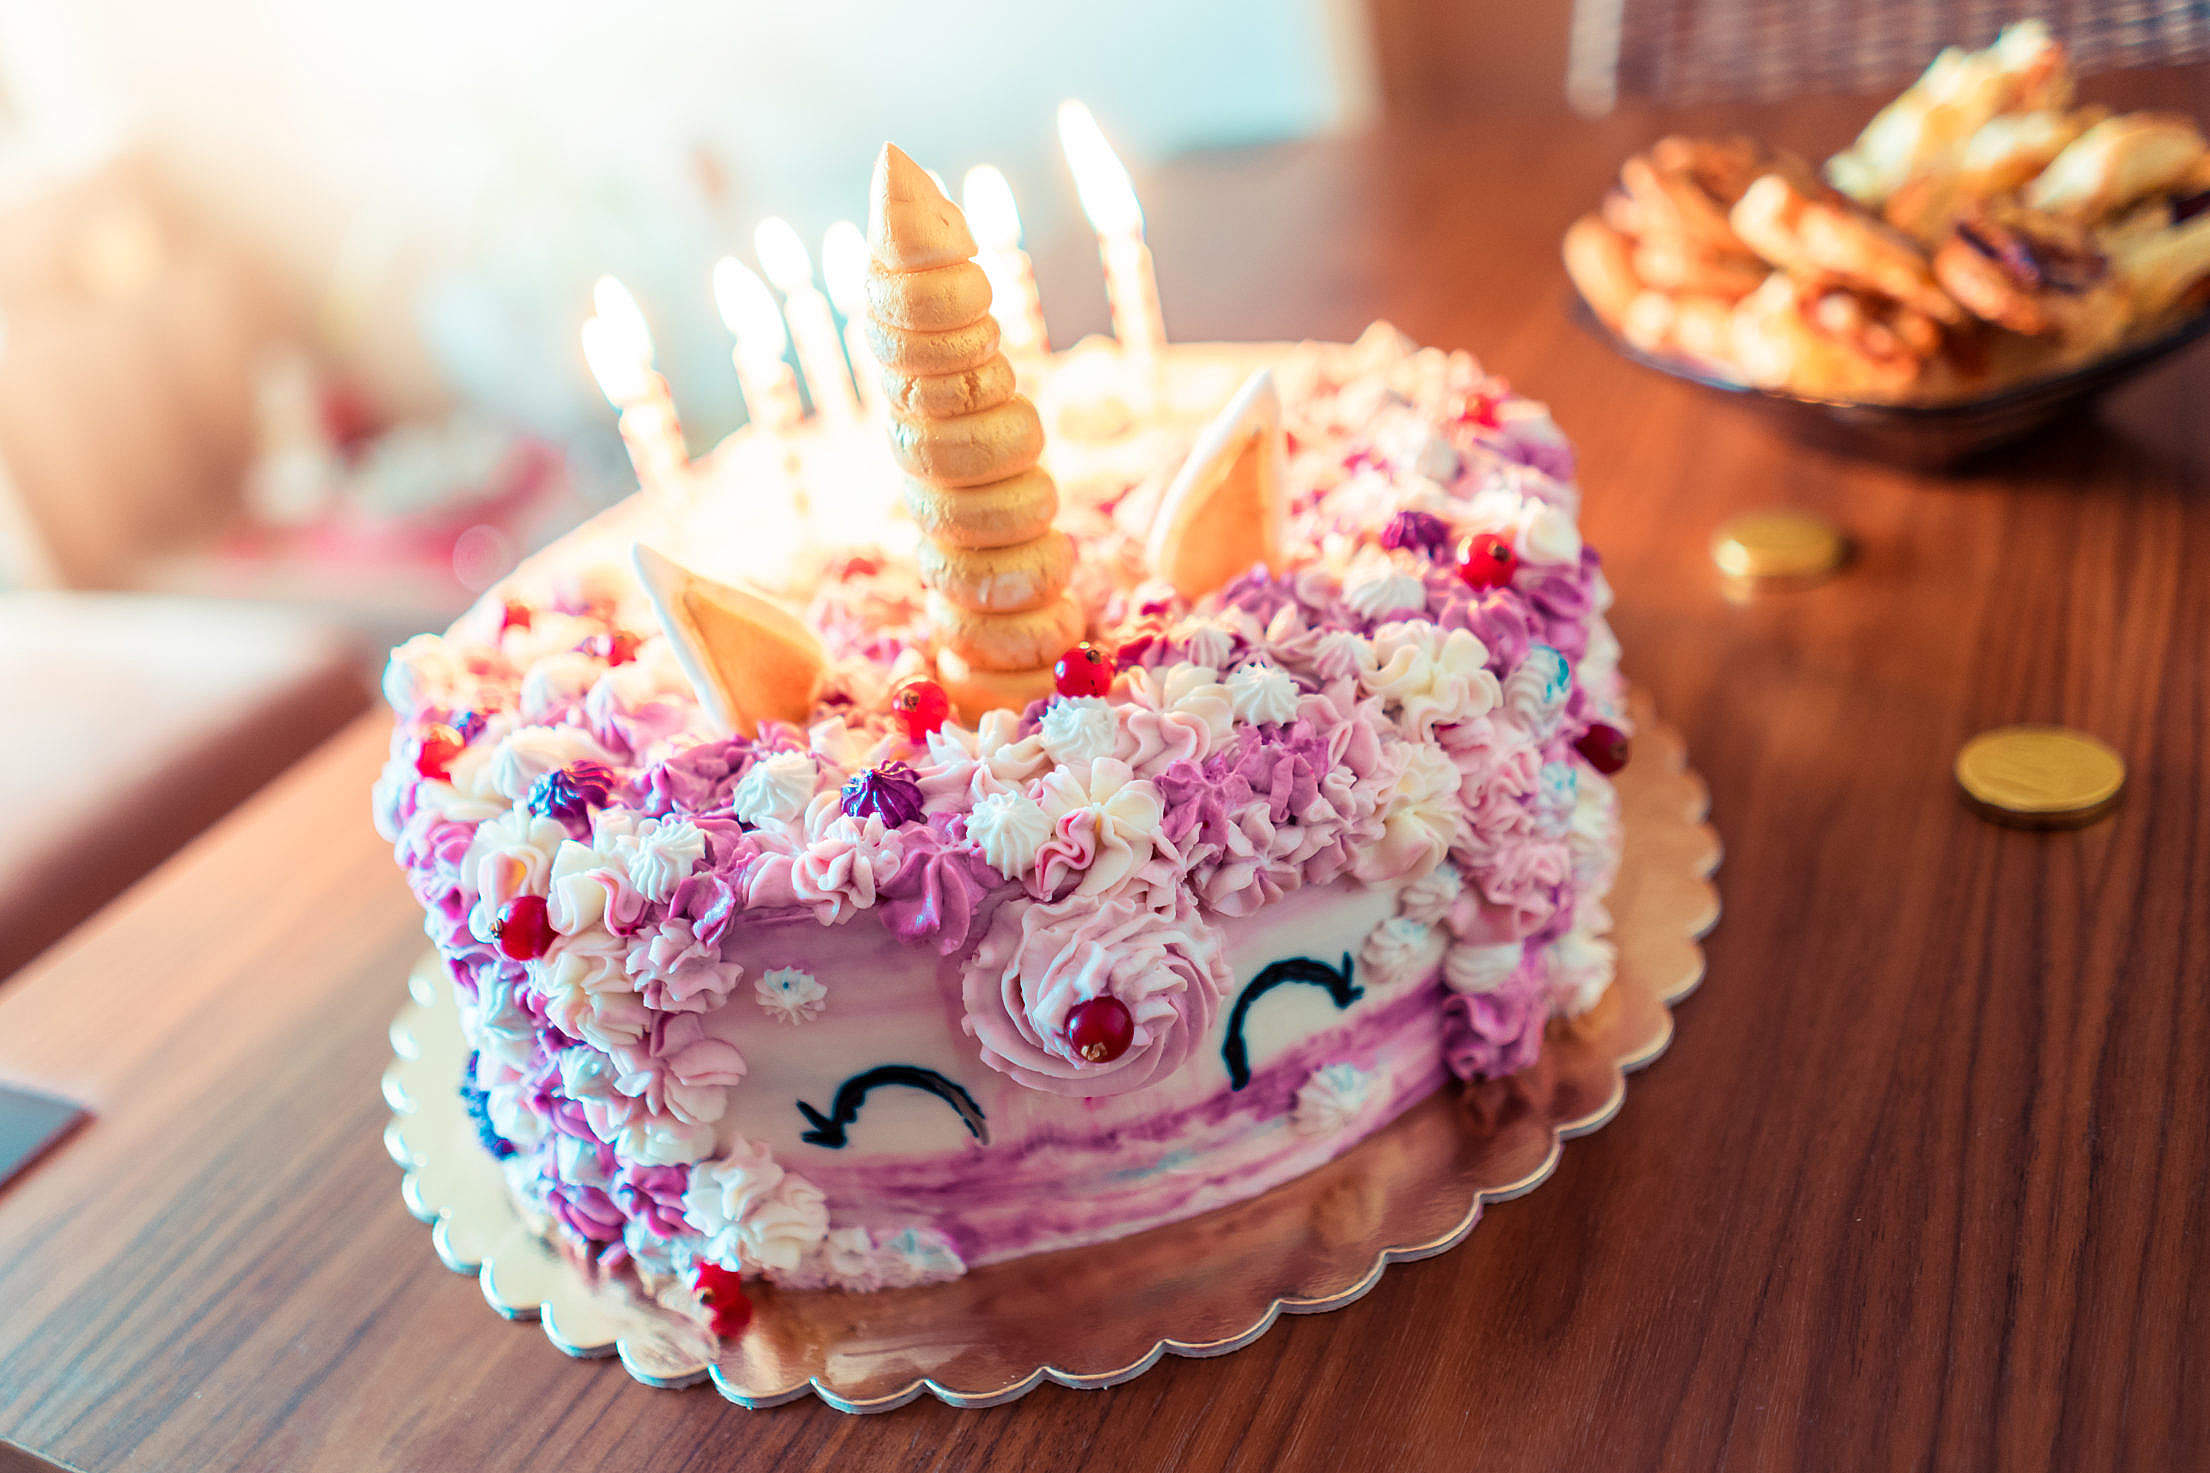 Colorful Unicorn Birthday Cake Free Stock Photo